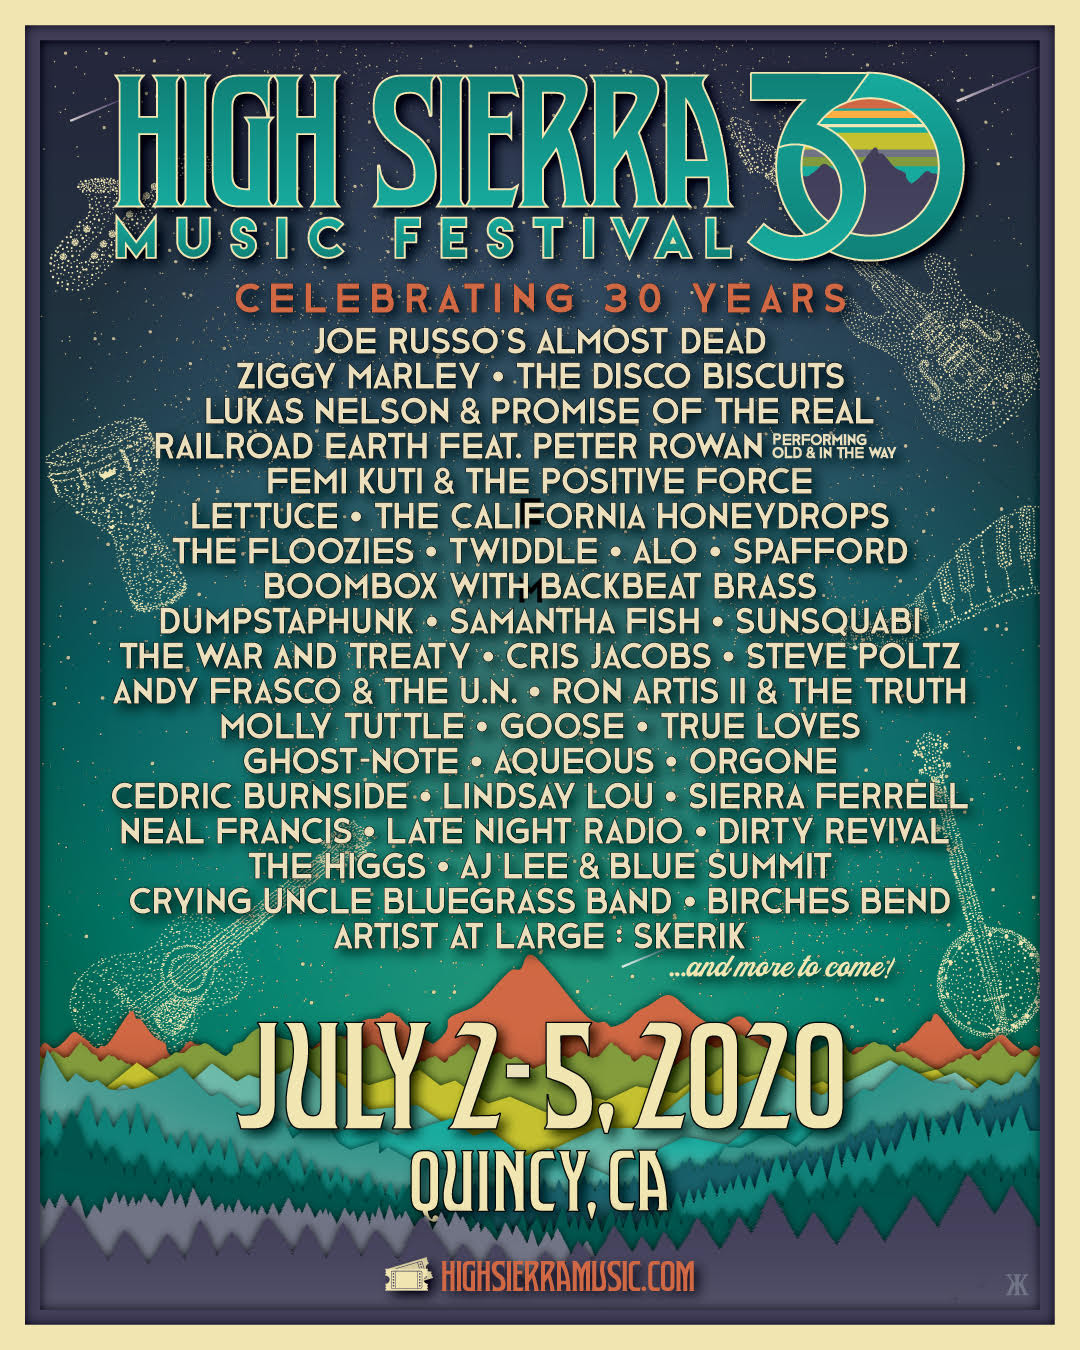 Ziggy Marley Set To Perform At High Sierra Music Festival 30th Year Celebration